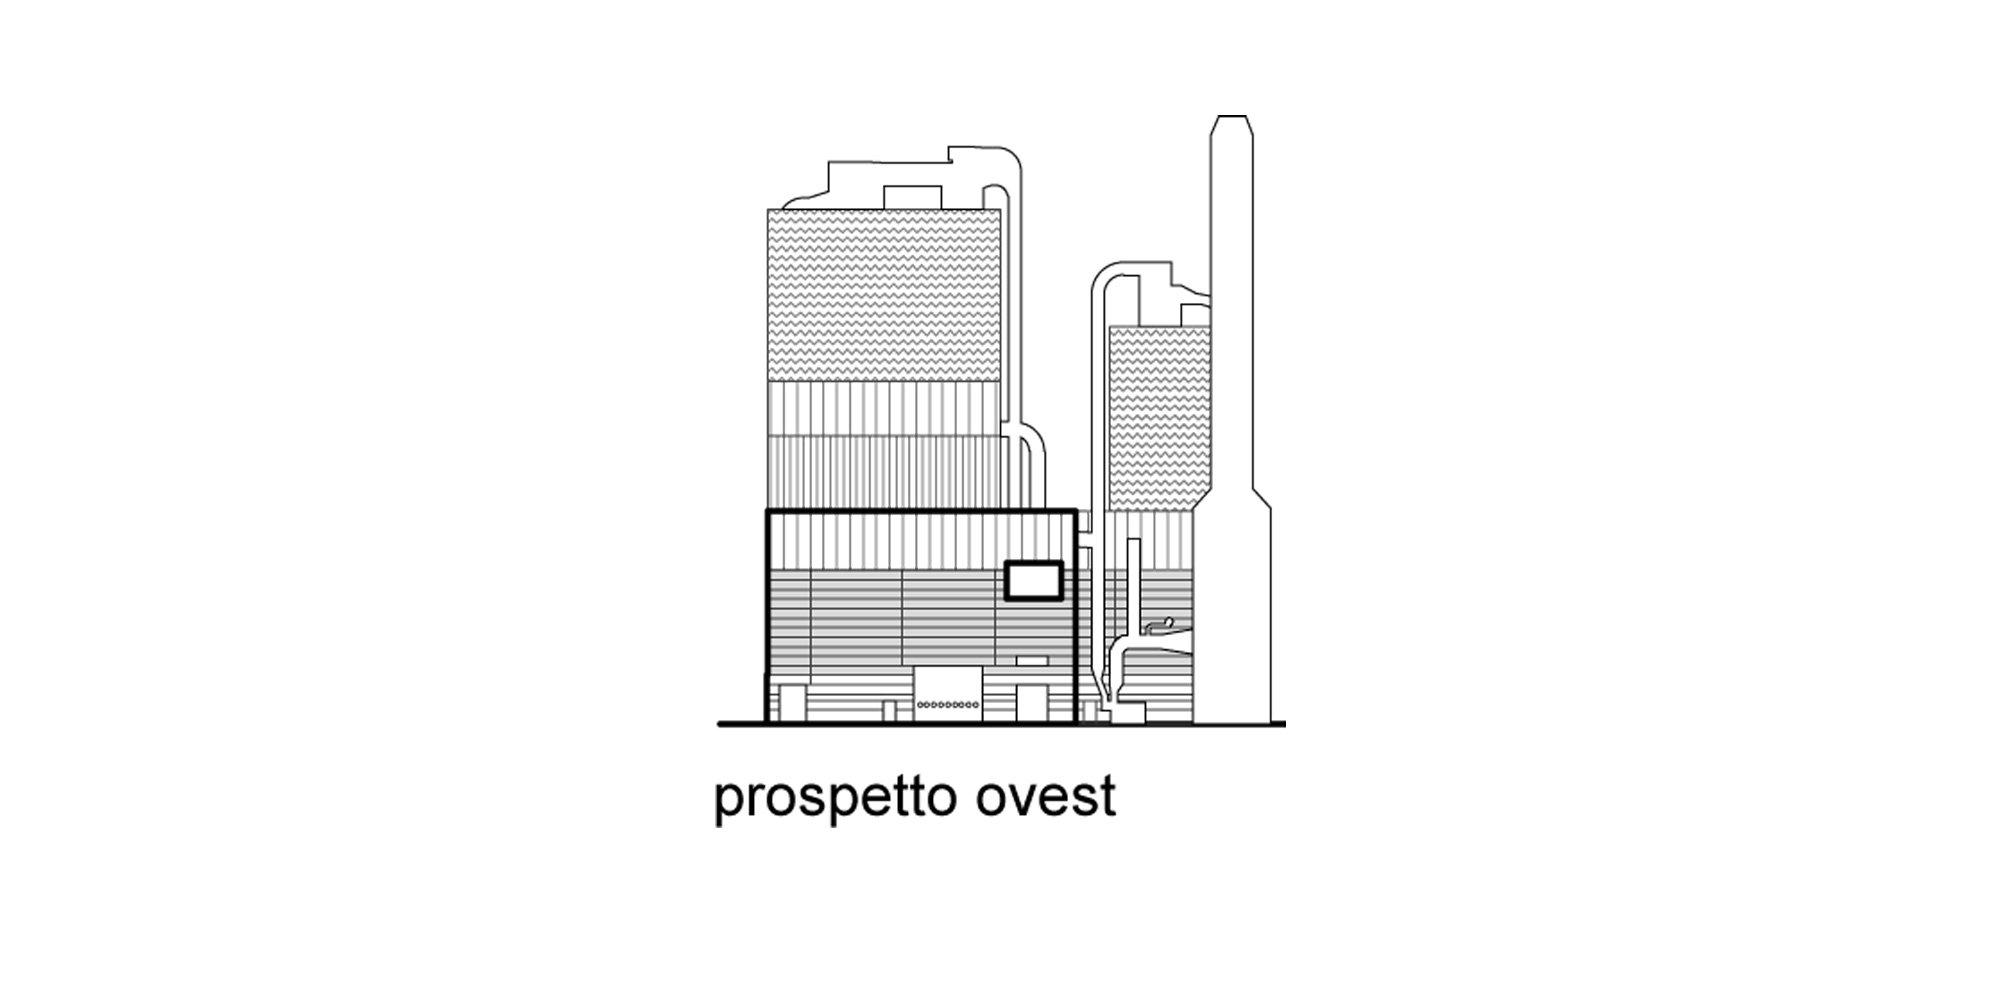 West elevation © Valle Architetti Associati